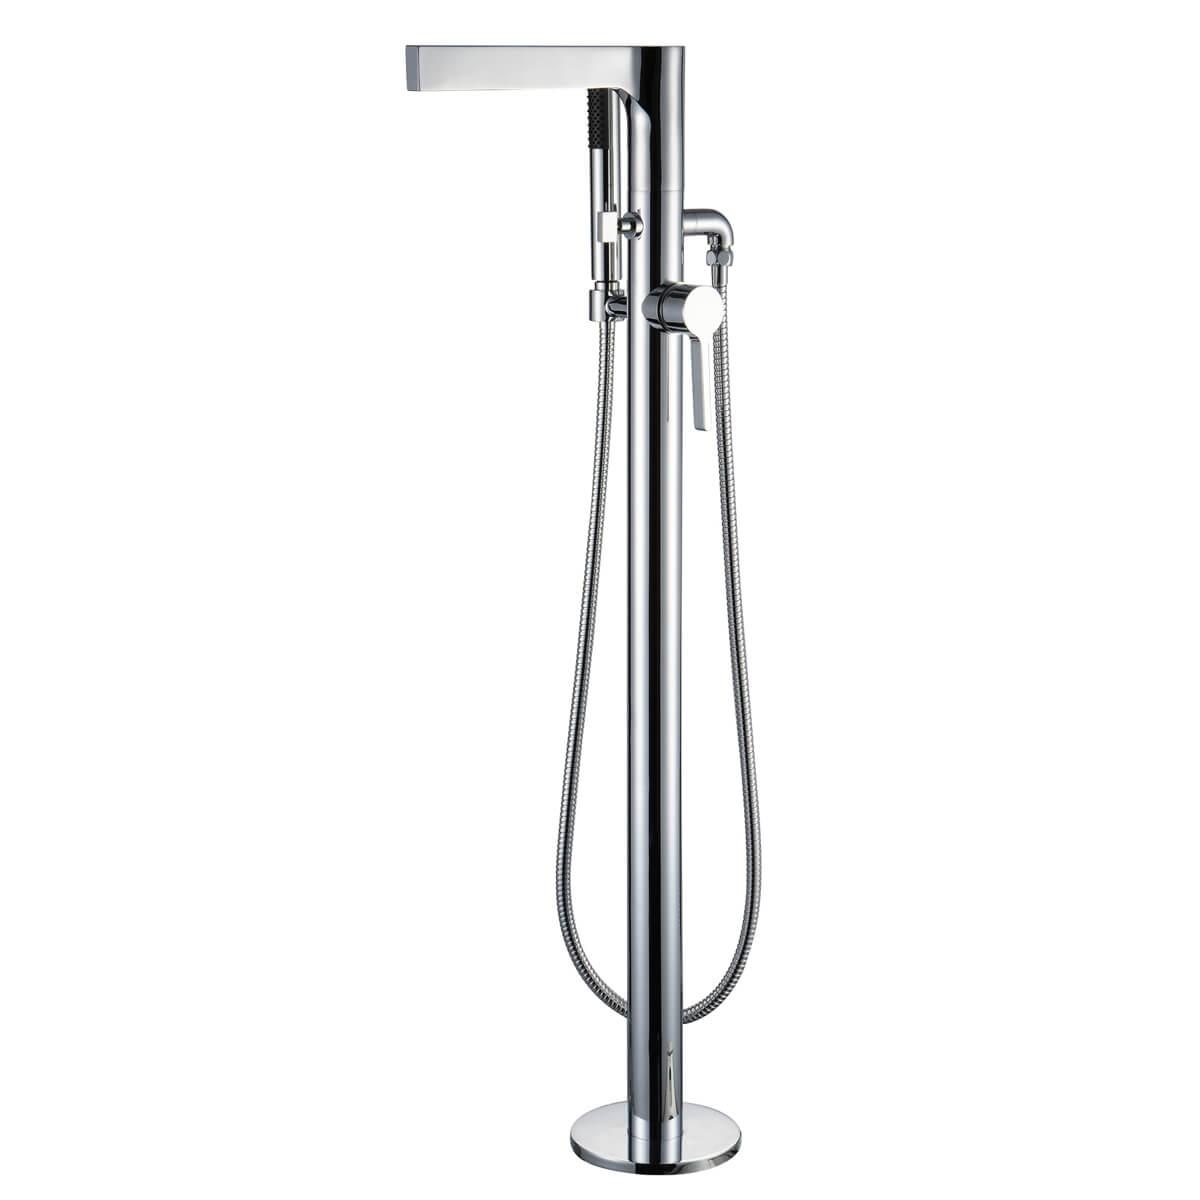 Frontline Gemini Freestanding Bath Shower Mixer Tap